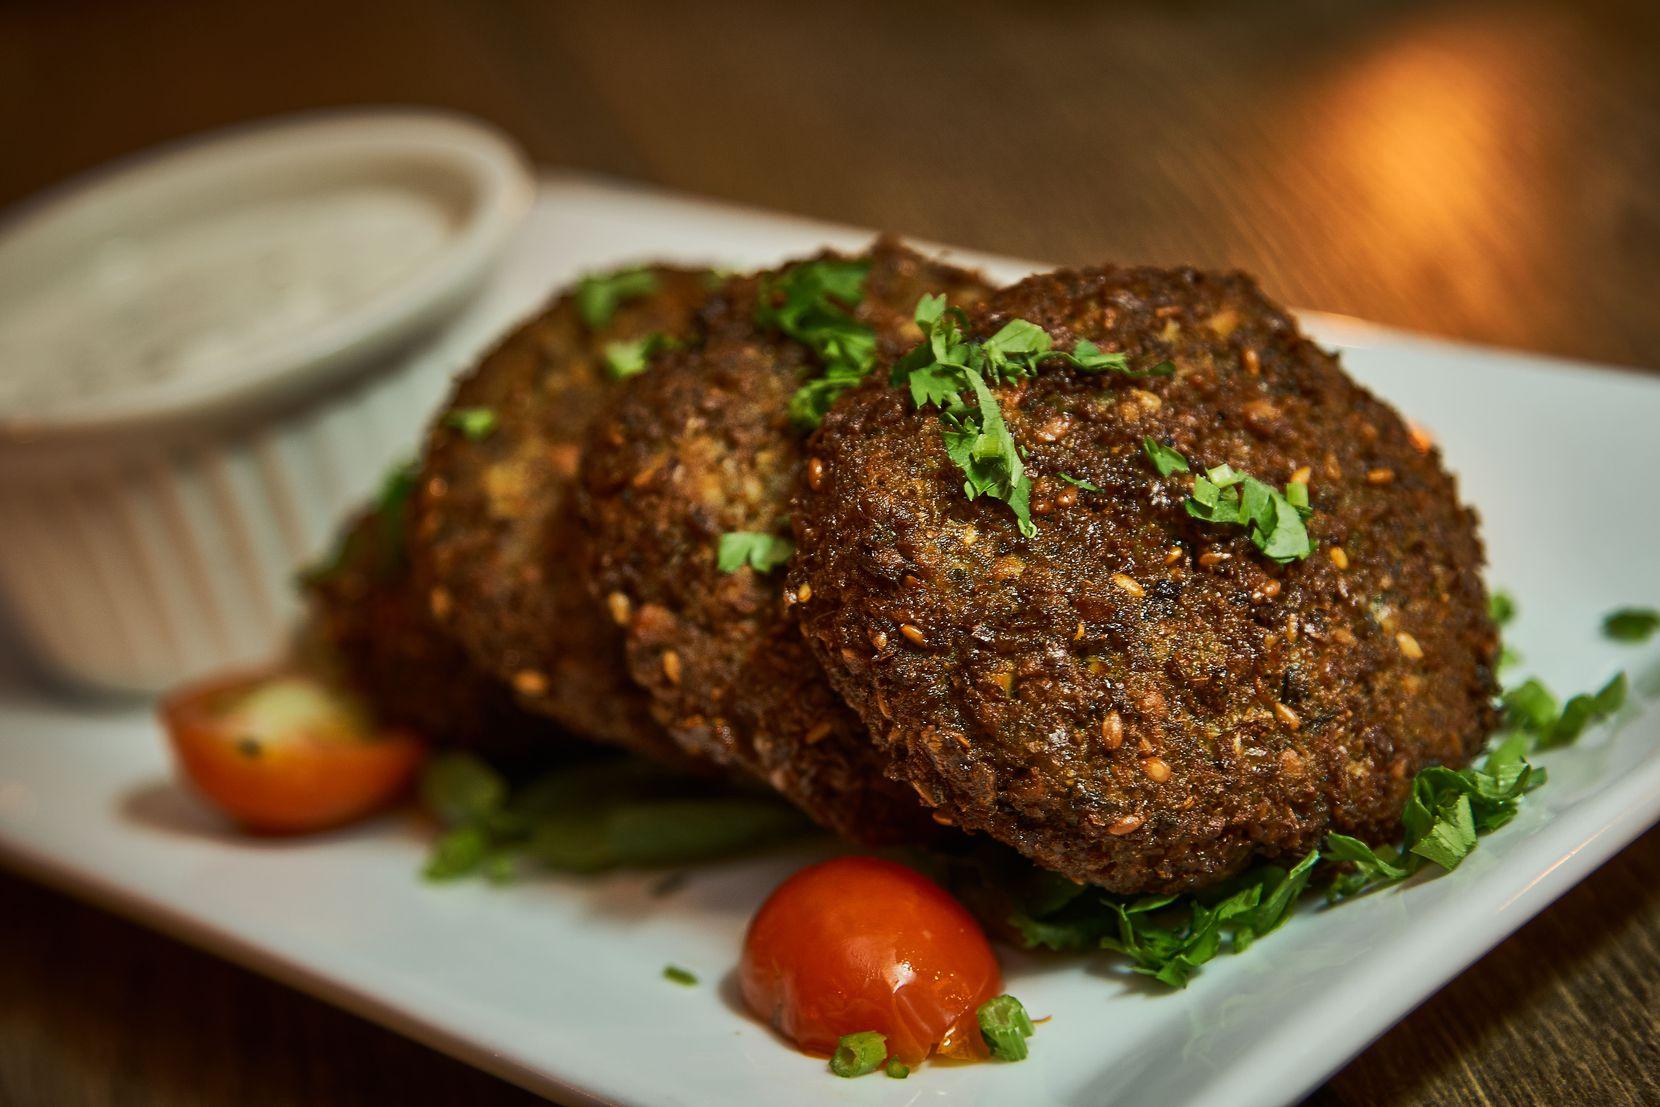 Gluten-free falafel from Ephesus restaurant in Dallas.